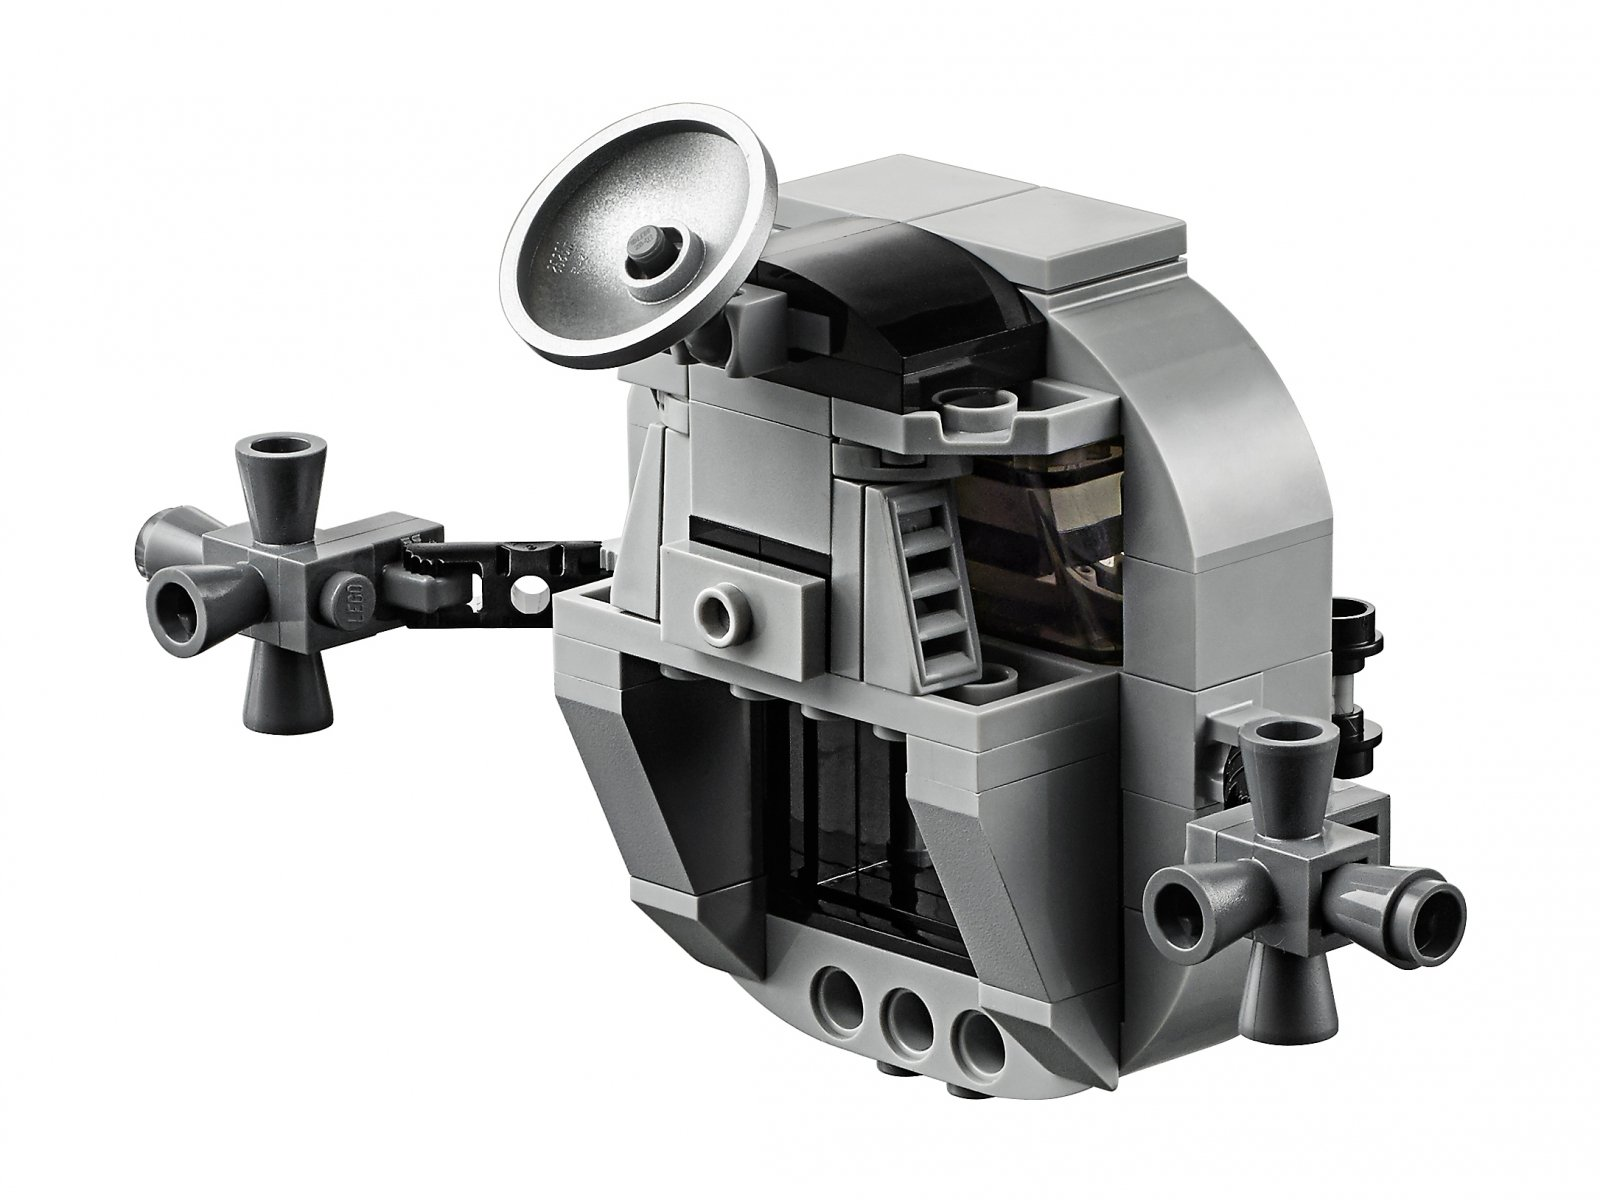 LEGO Creator Expert Lądownik księżycowy Apollo 11 NASA 10266